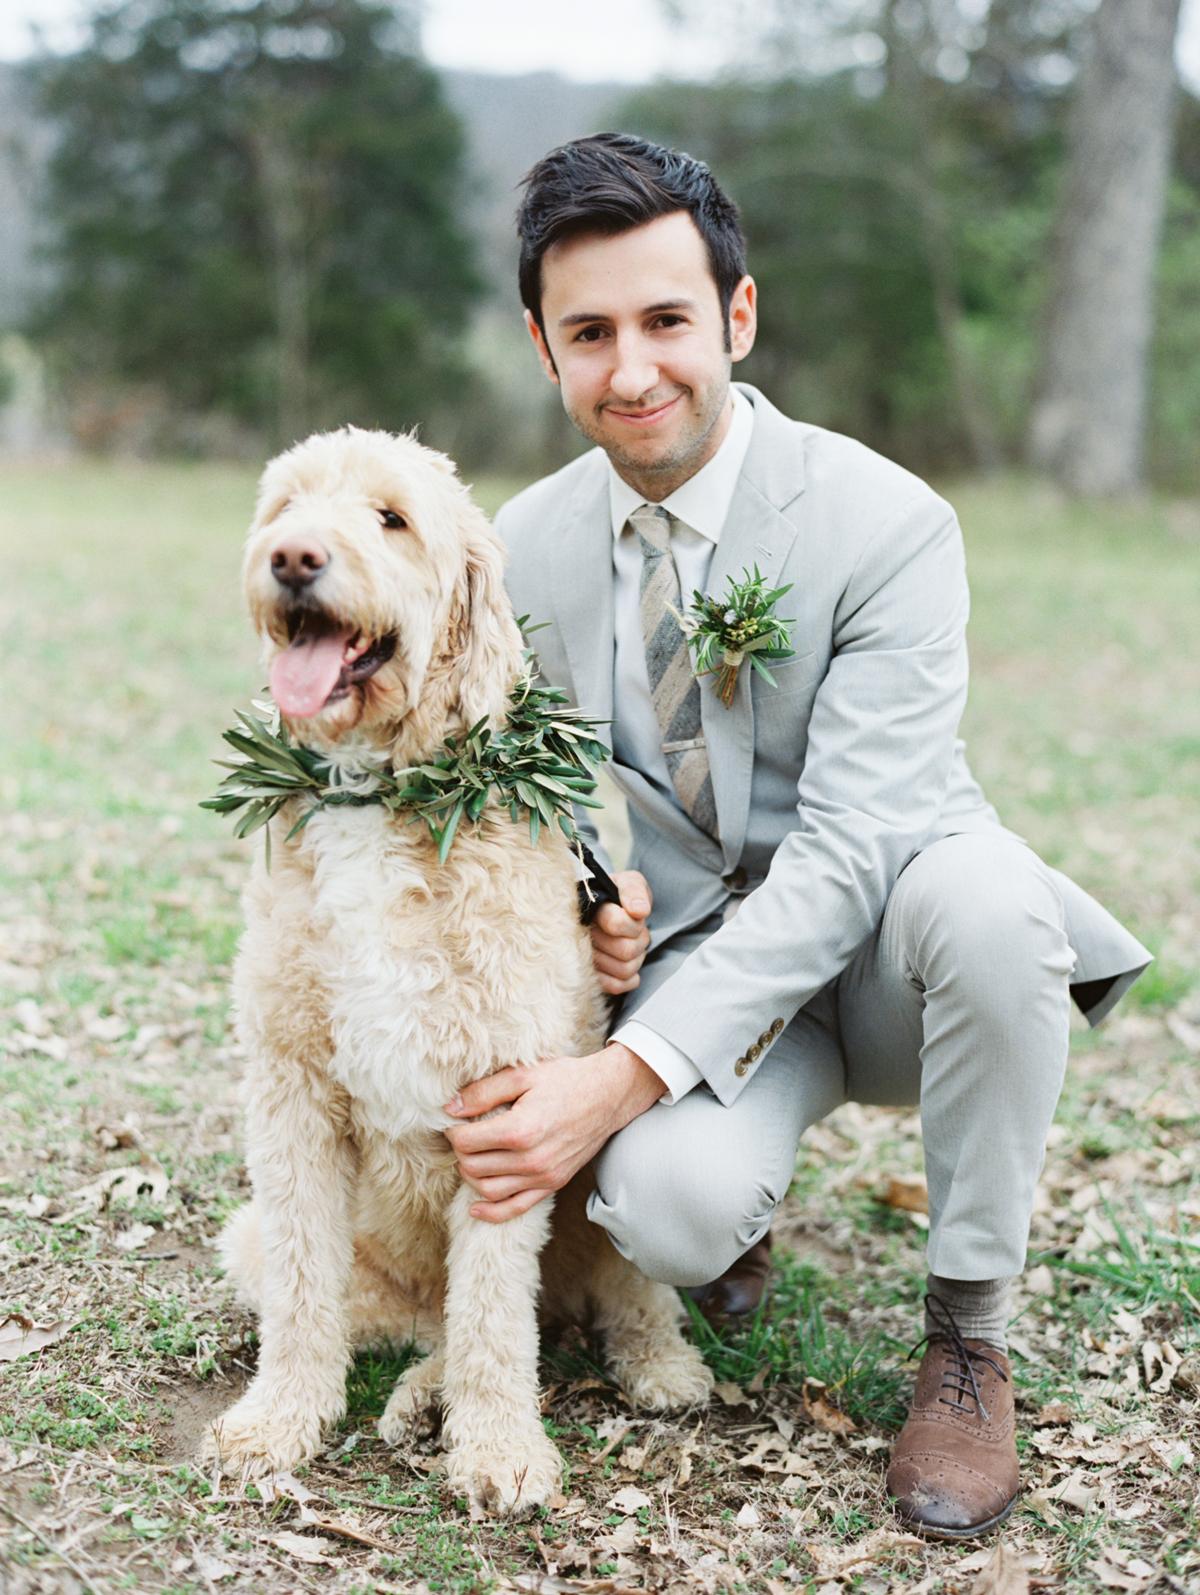 wedding wreath worn by dog sitting next to groom